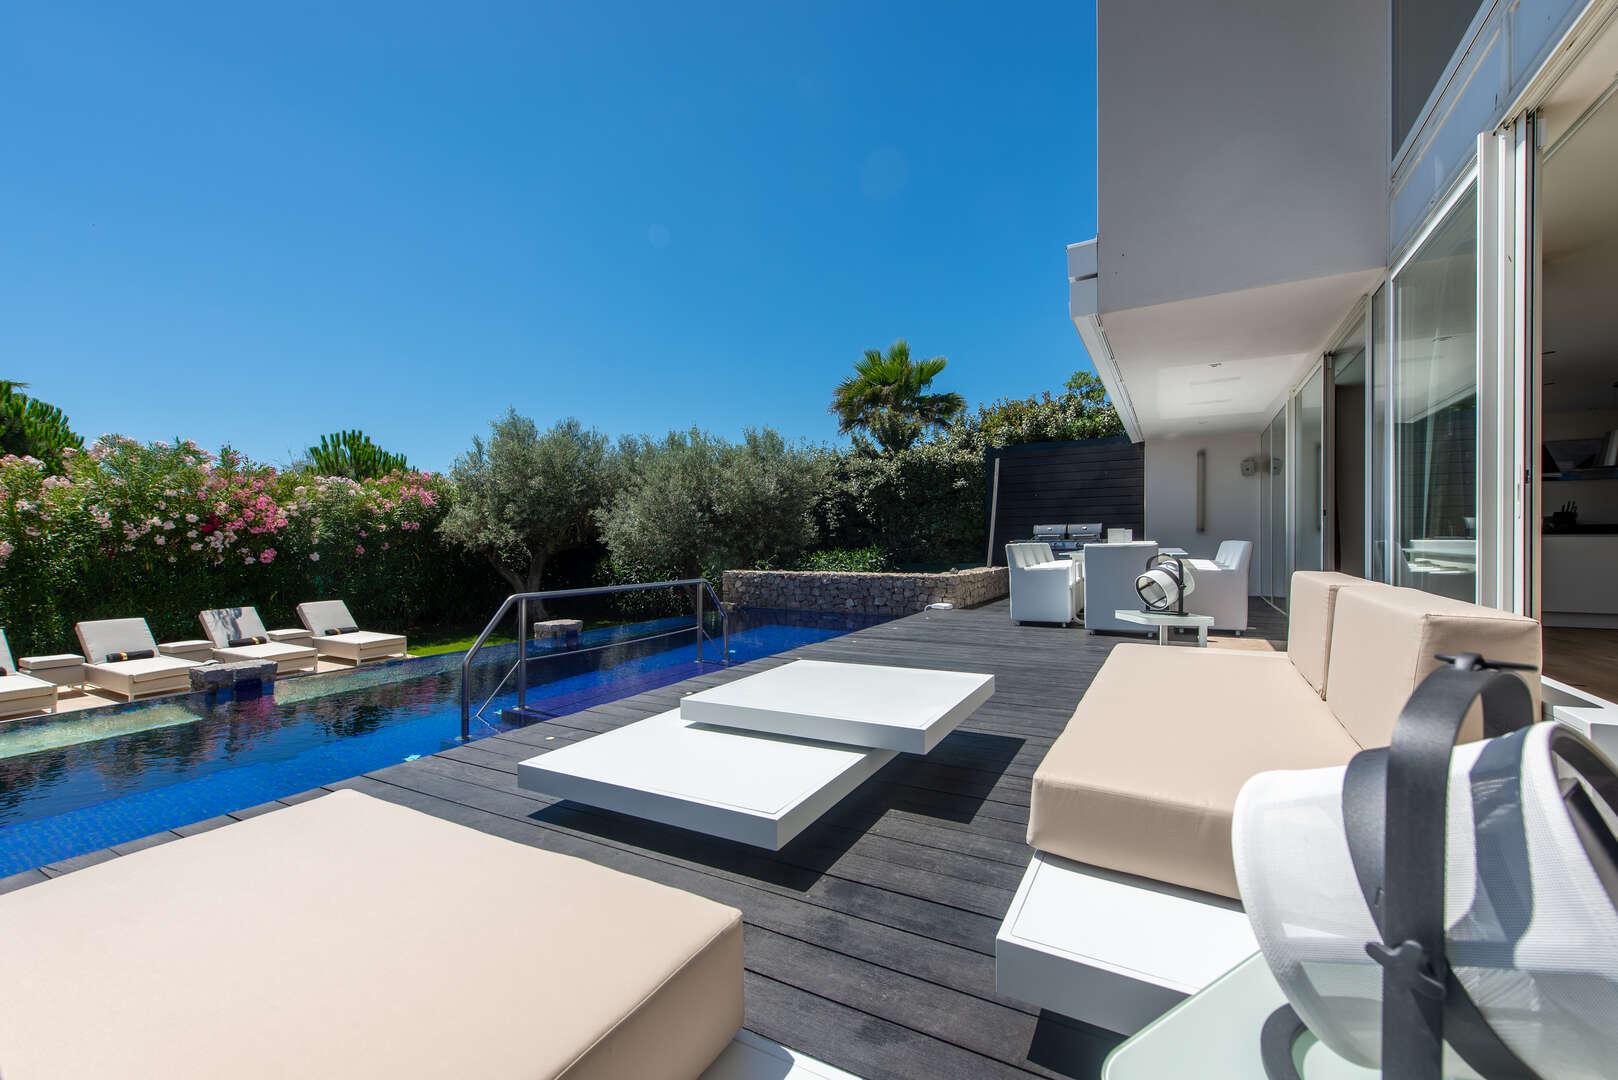 - Villa Emerald - Image 1/39